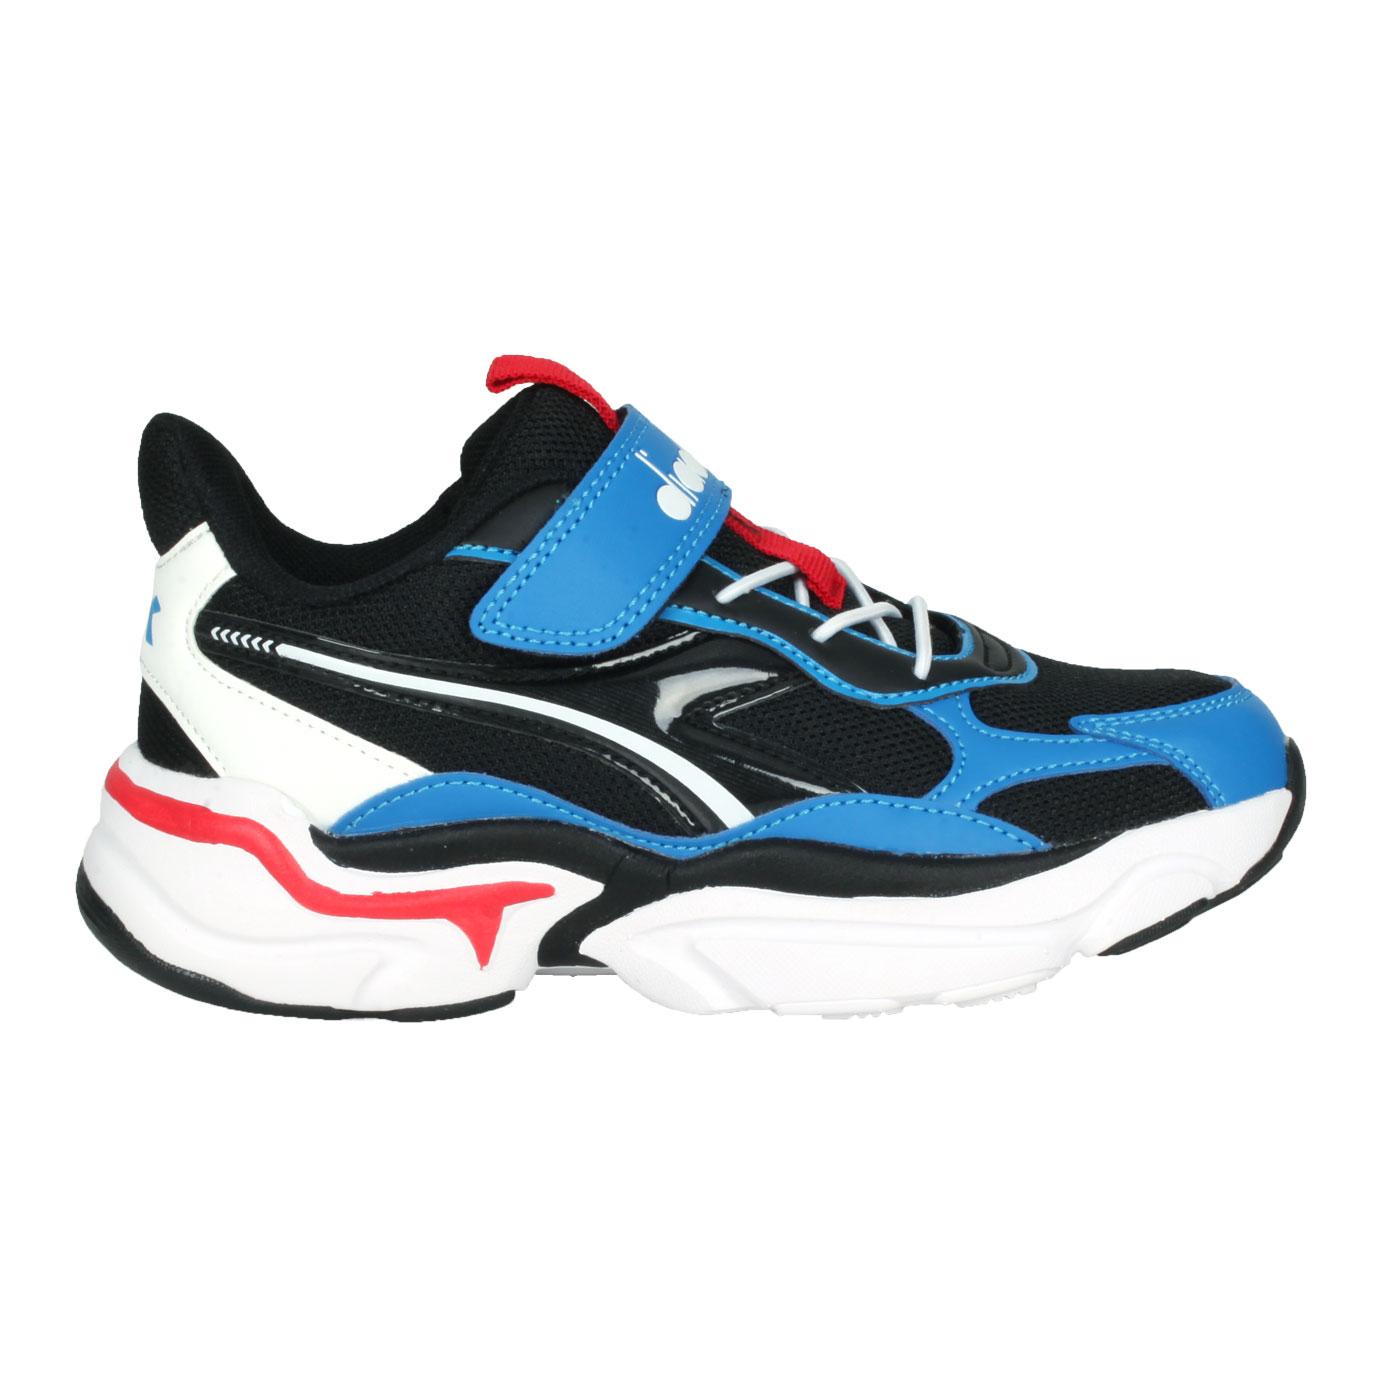 DIADORA 中童運動生活時尚鞋-超寬楦 DA13053 - 黑白紅藍